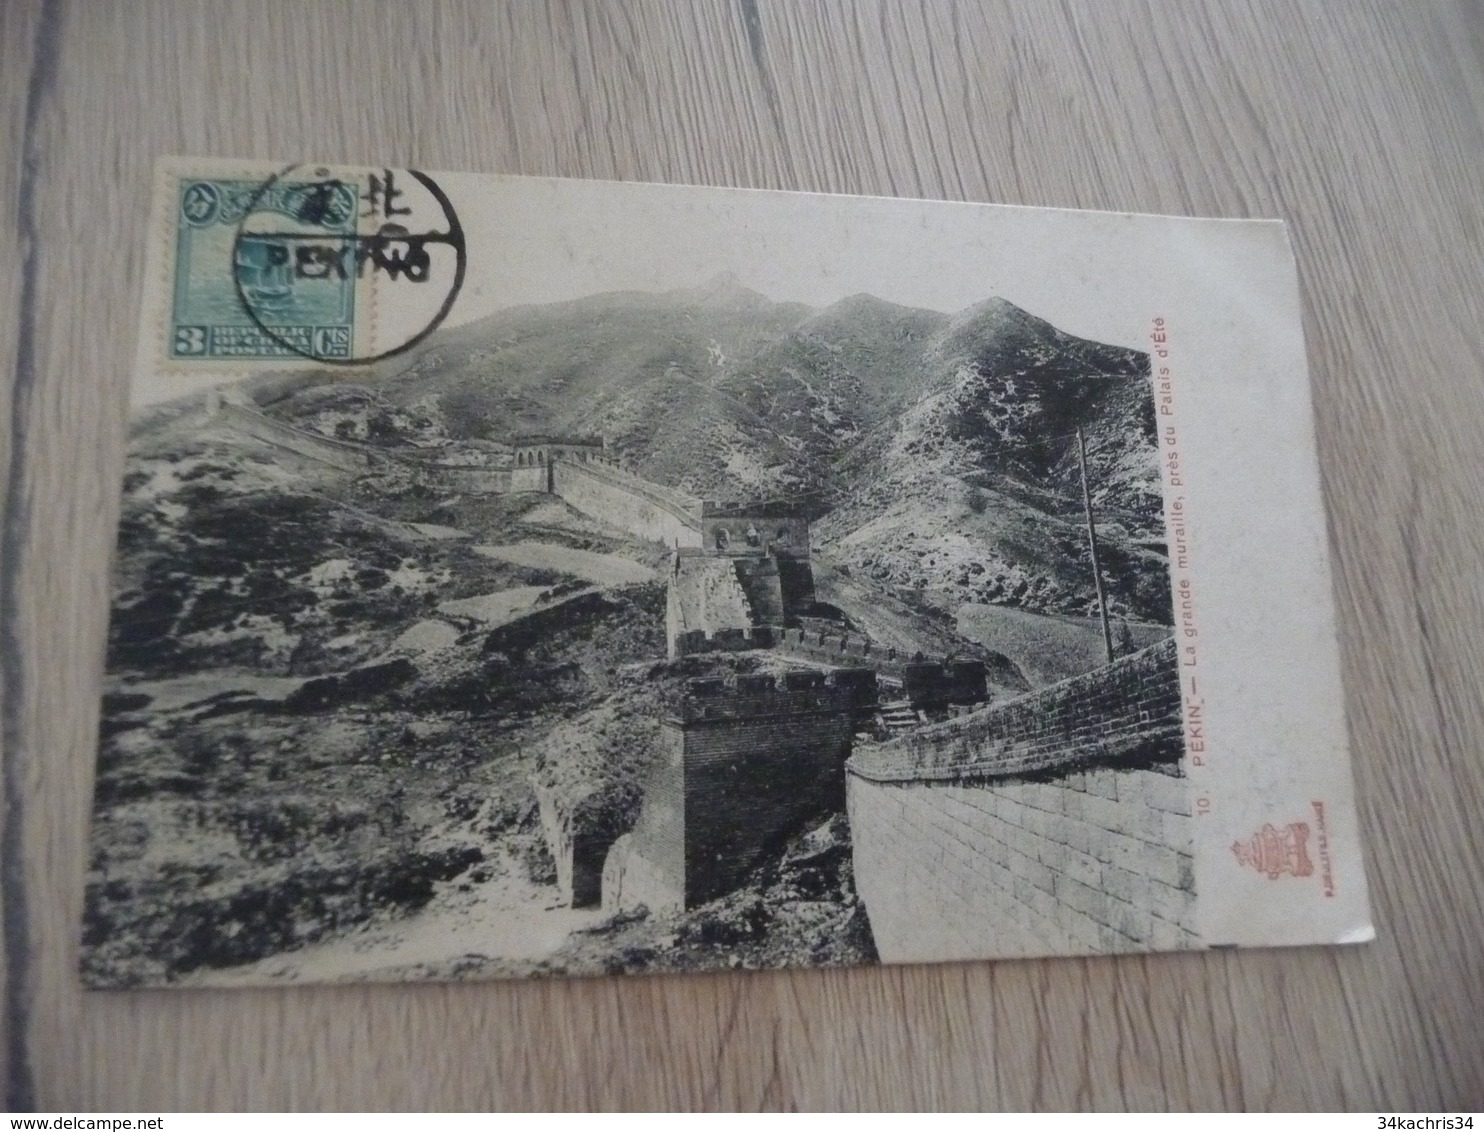 CPA Chine China La Rande Muraille Près Du Palais D'été 1 Old Stamp  Paypal Ok Out Of Europe - China